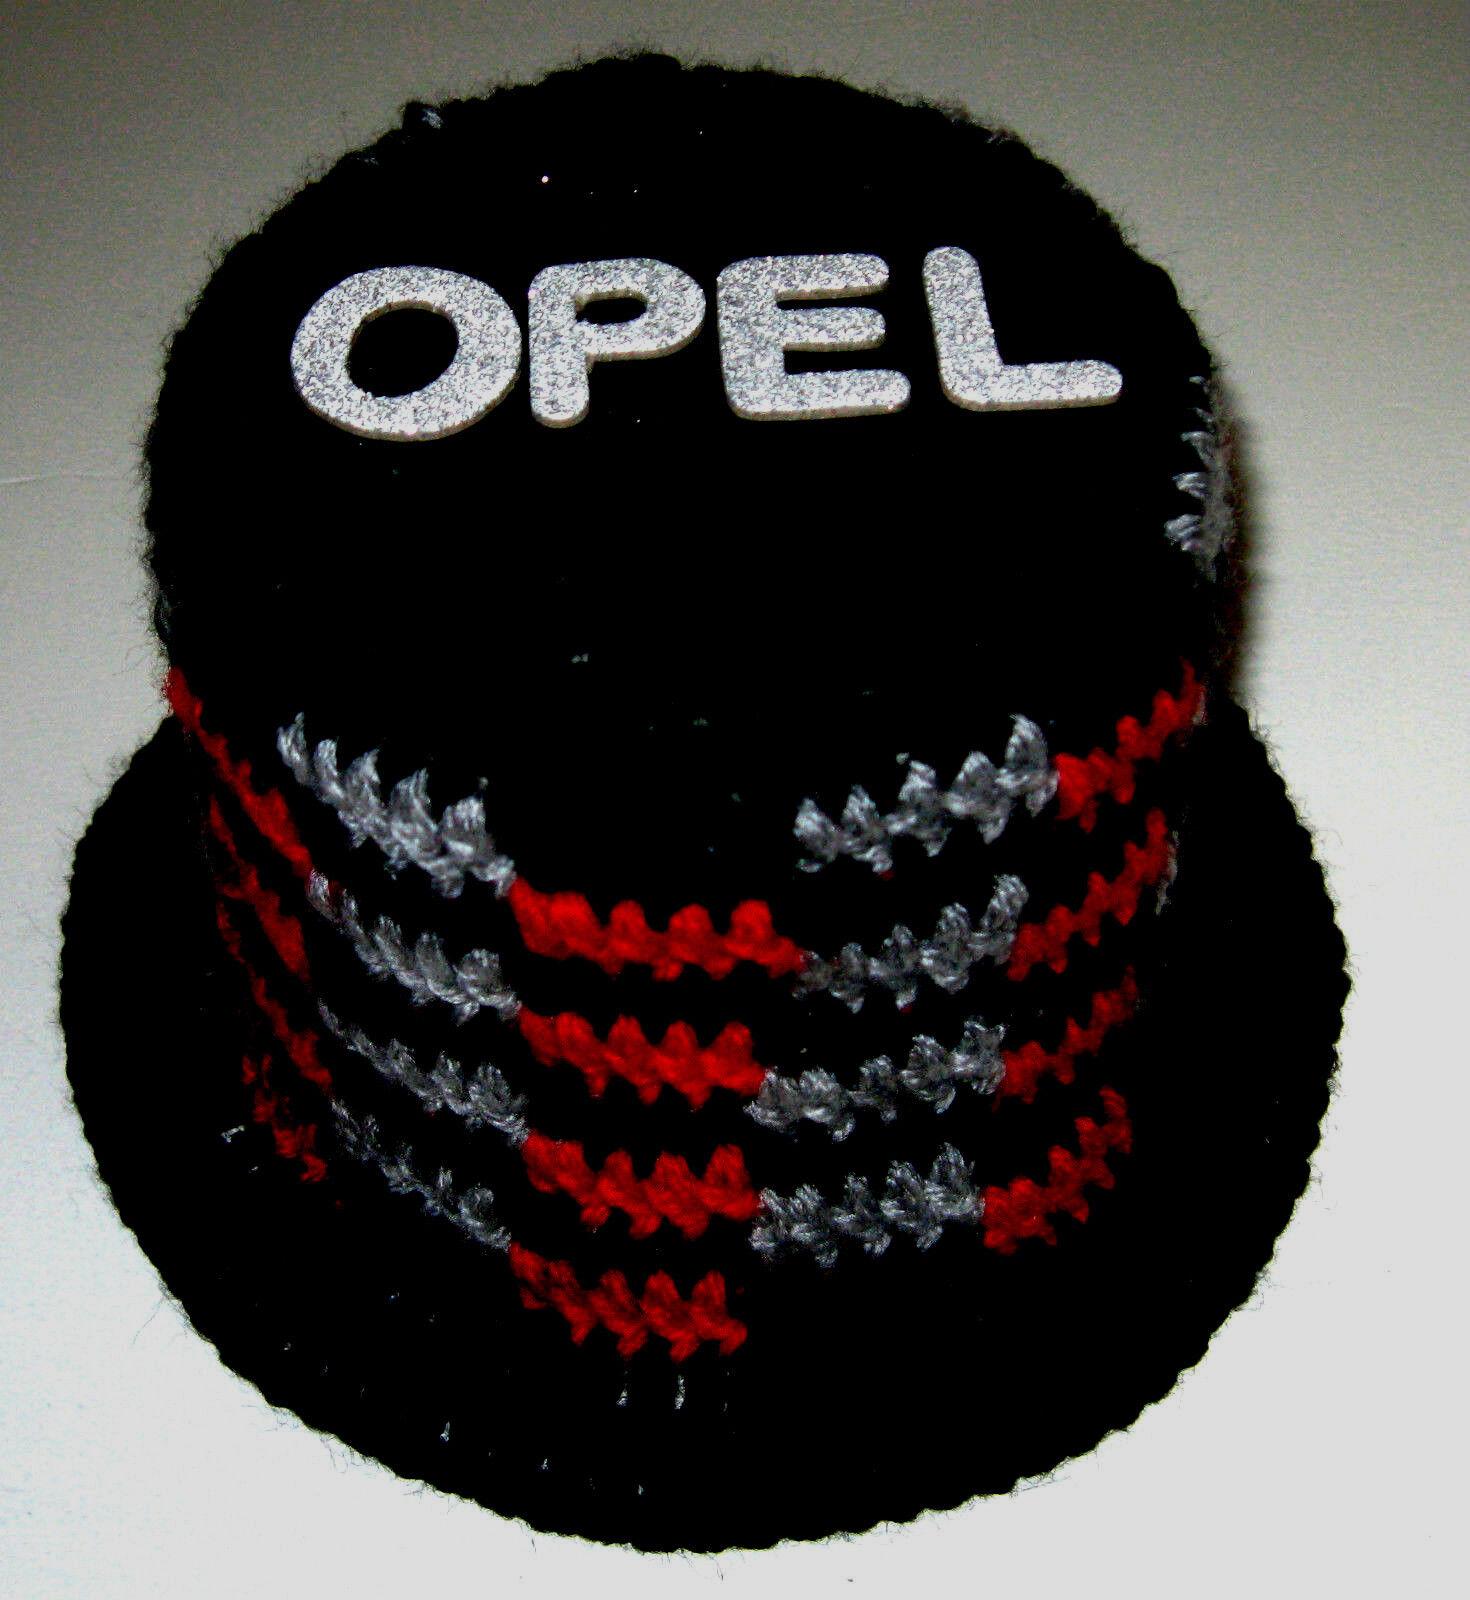 """ OPEL "" Klohut für Klorolle-Toilettenpapier Husse-Hut"